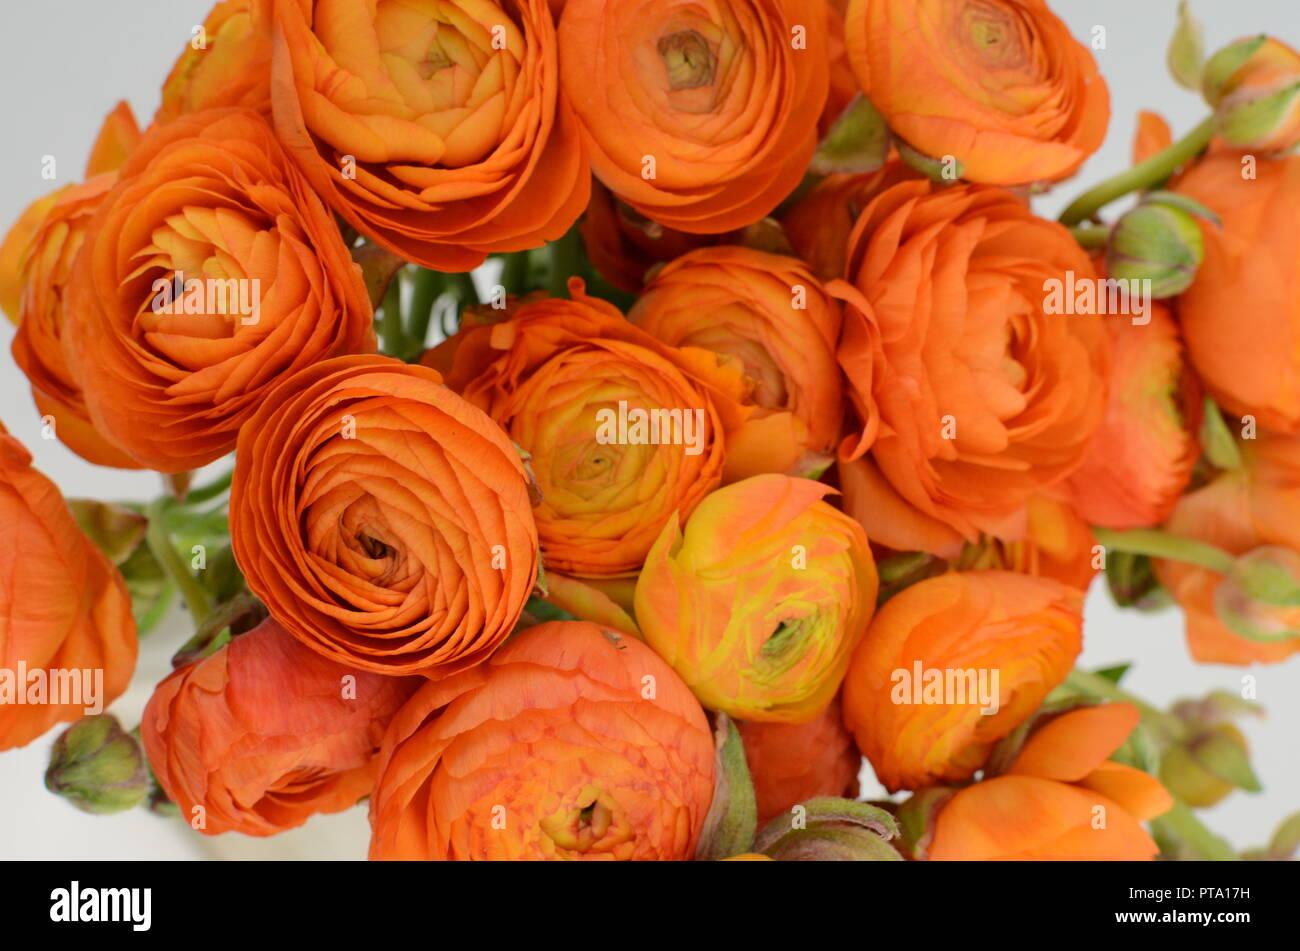 Persian Buttercup Bunch Pale Orange Ranunculus Flowers Light Background Wallpaper Stock Photo Alamy